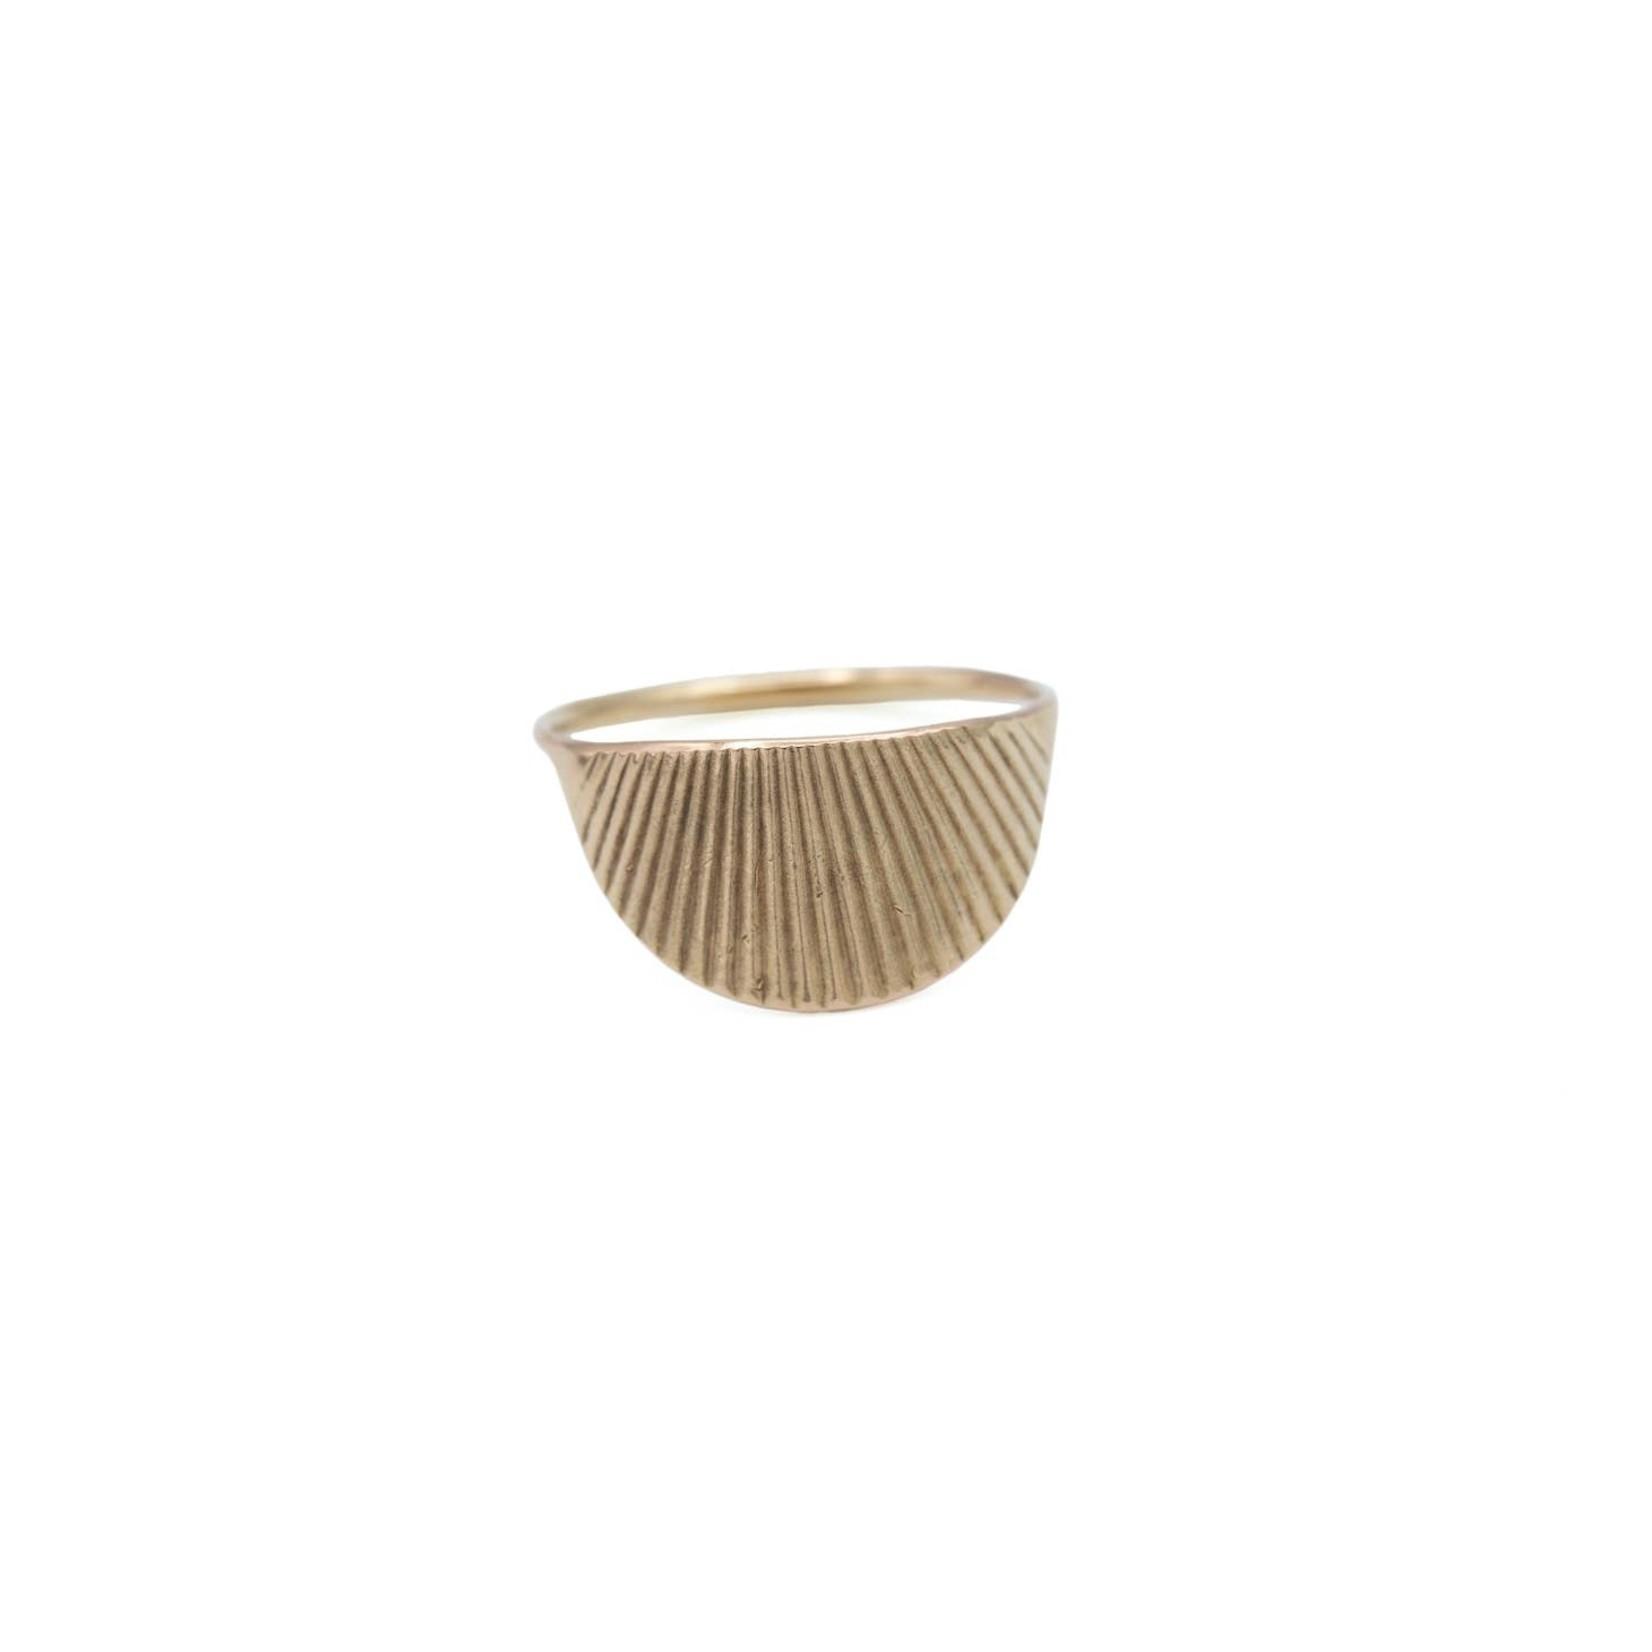 Mana Made Jewelry Jewelry by Mana Made Jewelry